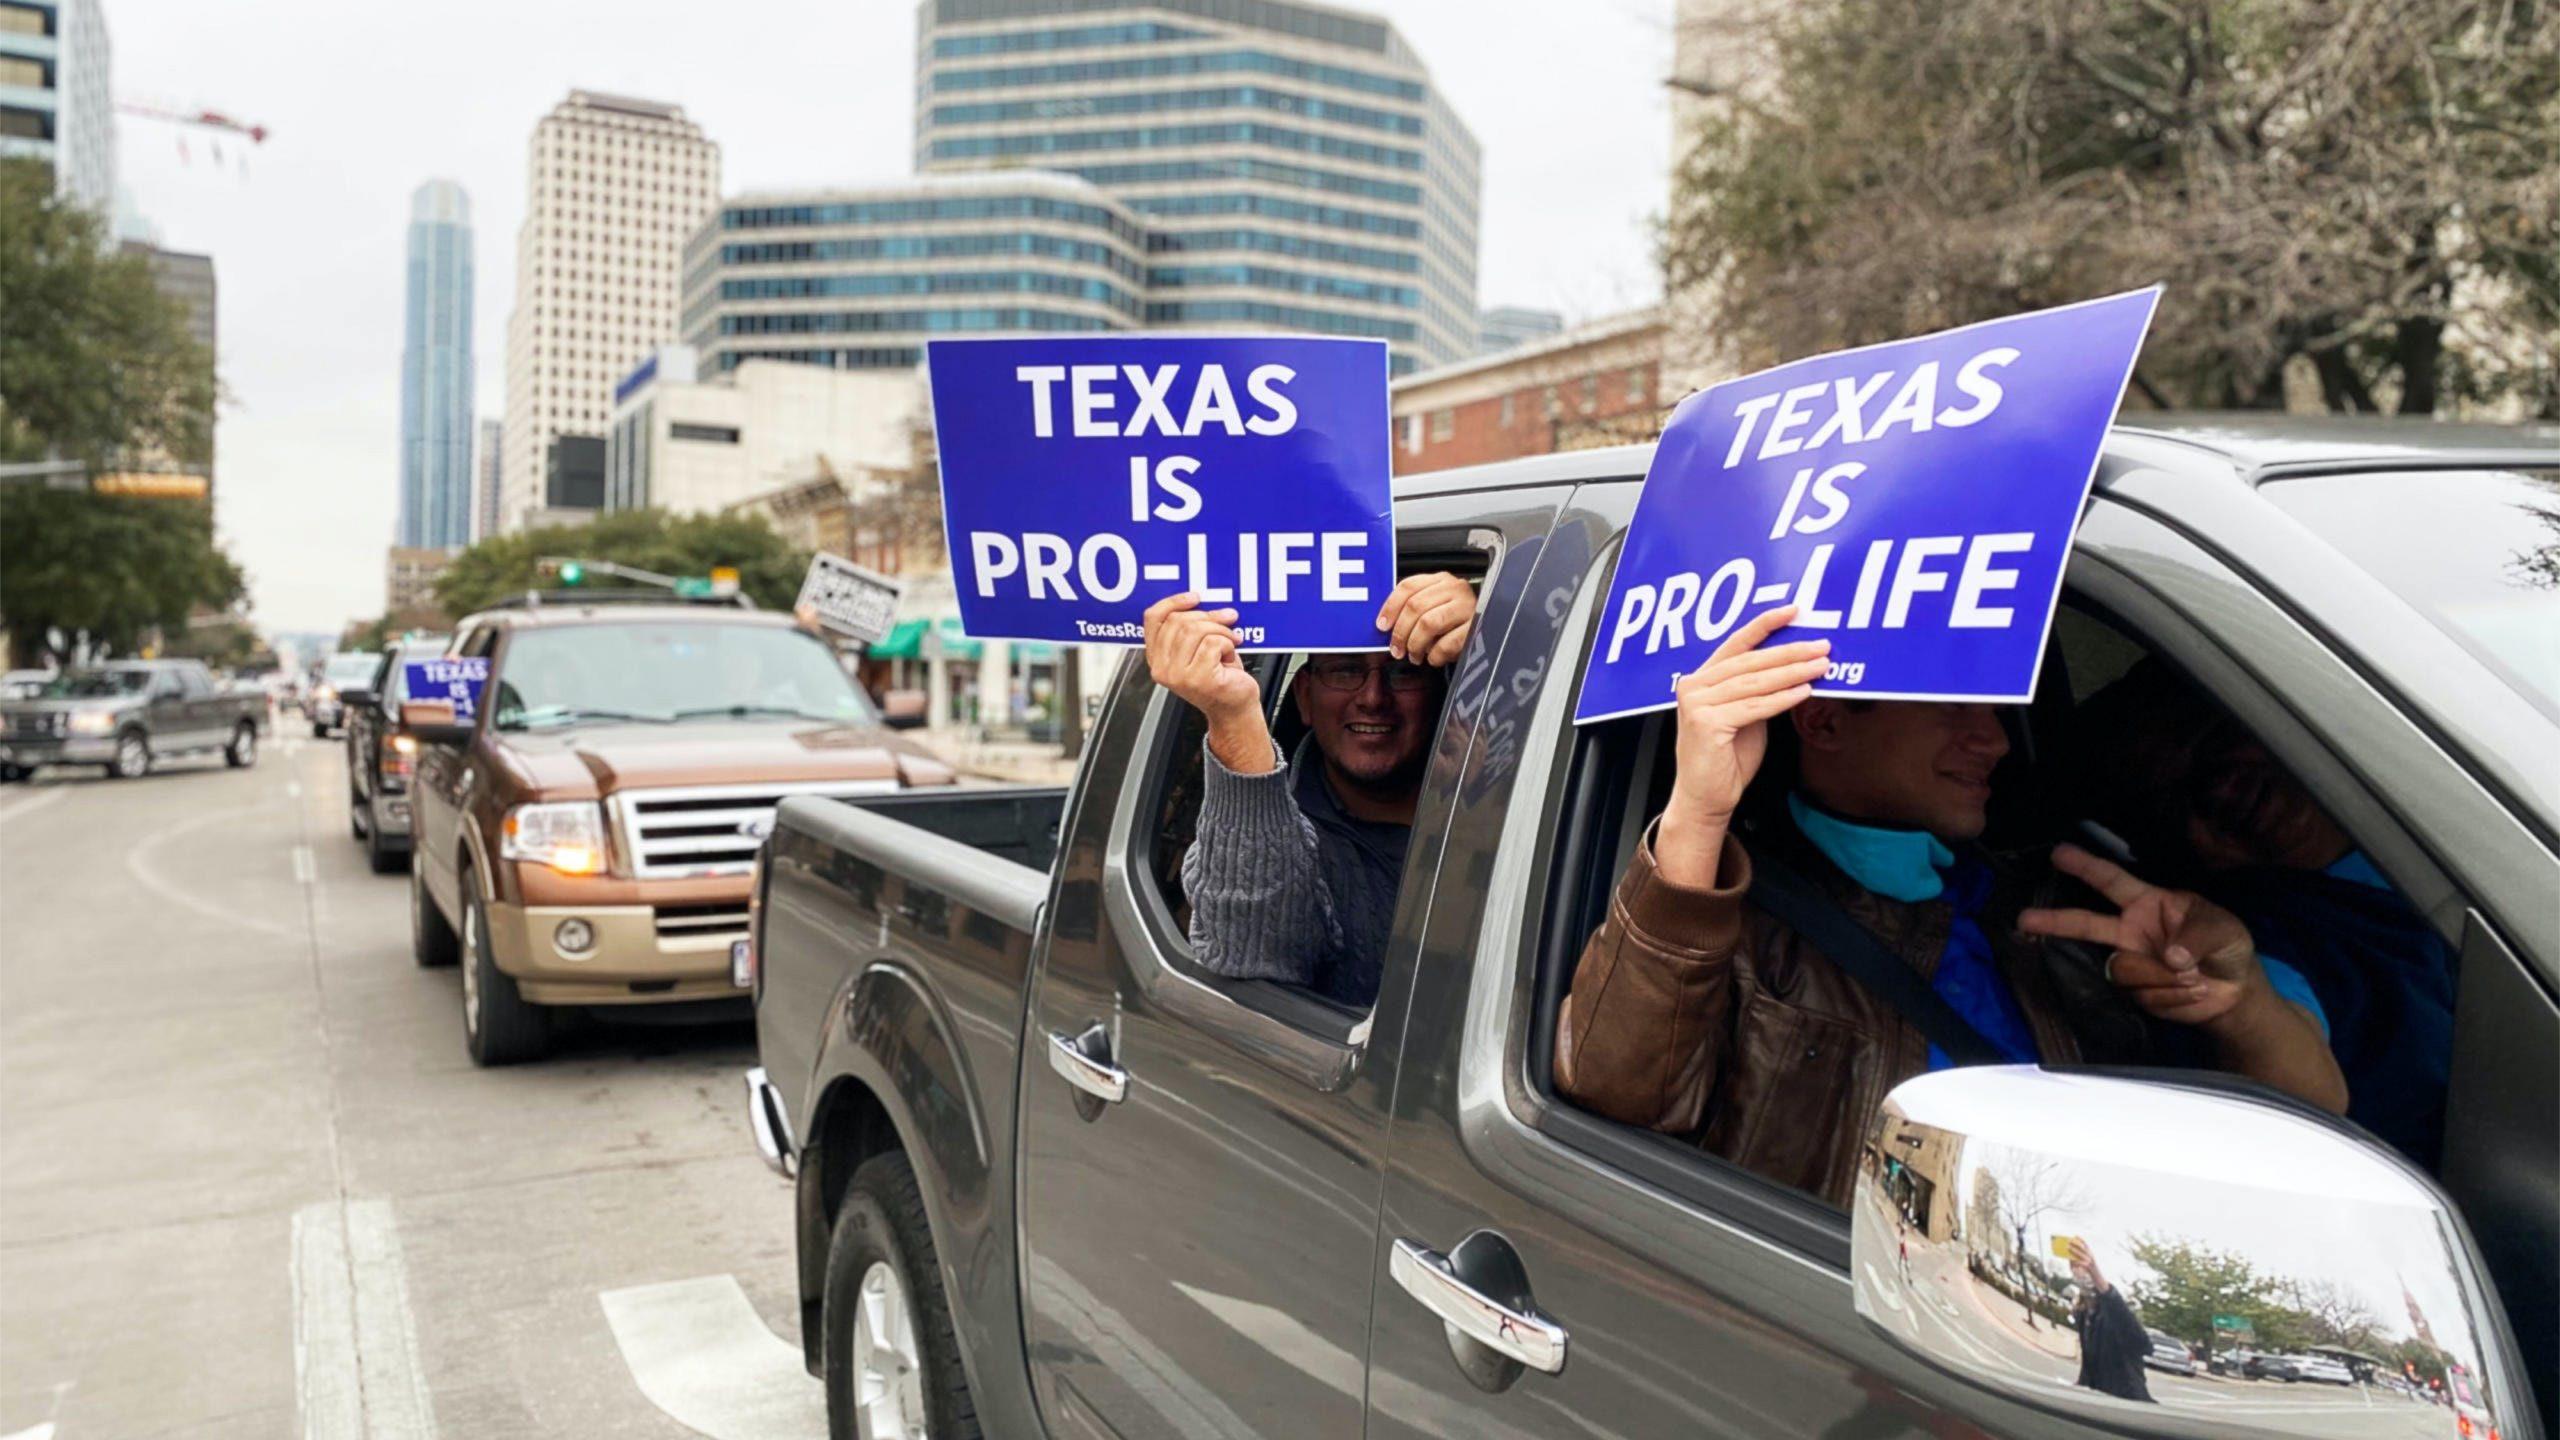 Texas pro-life